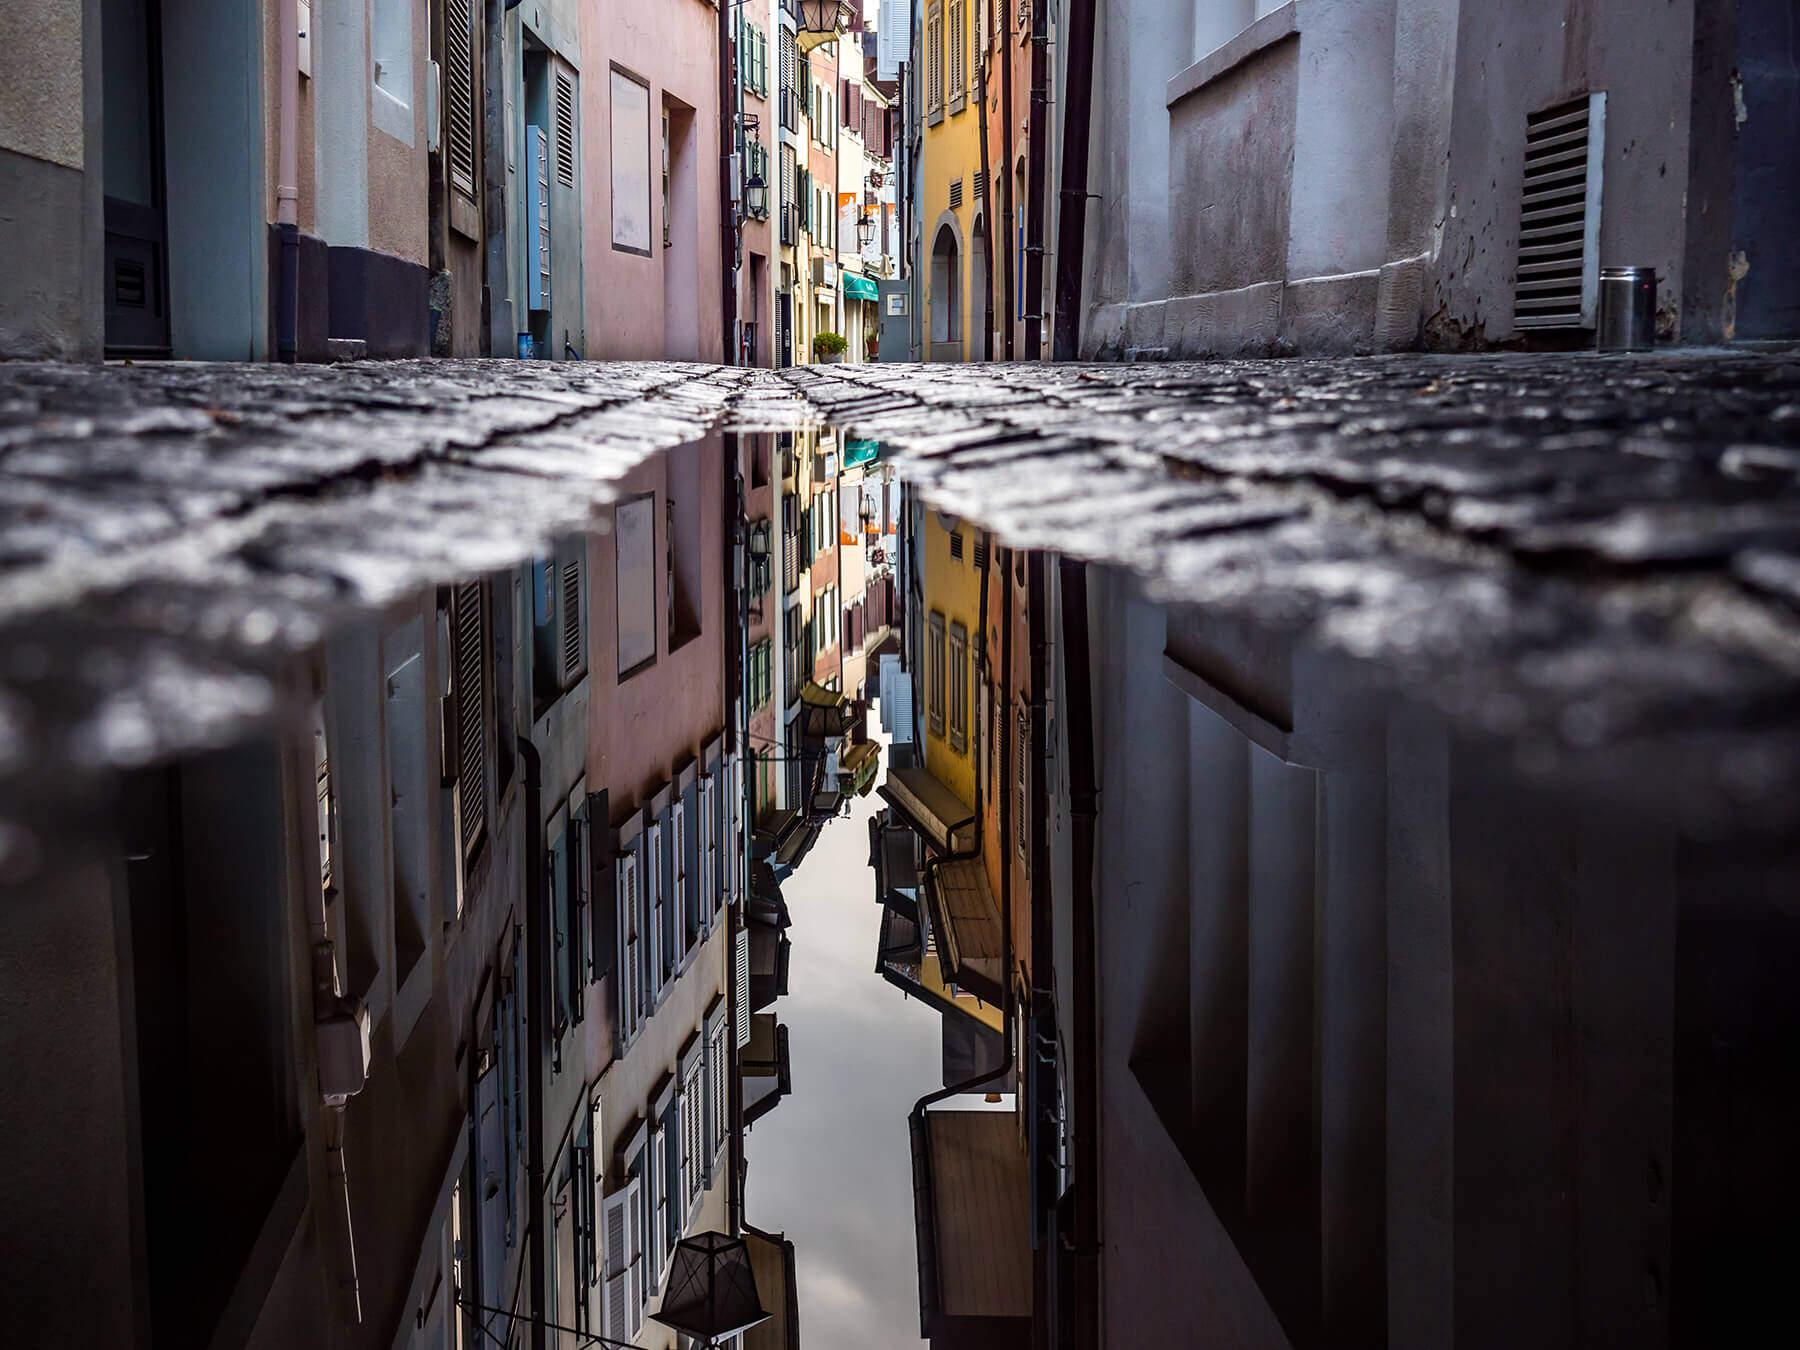 Reflection photo on street